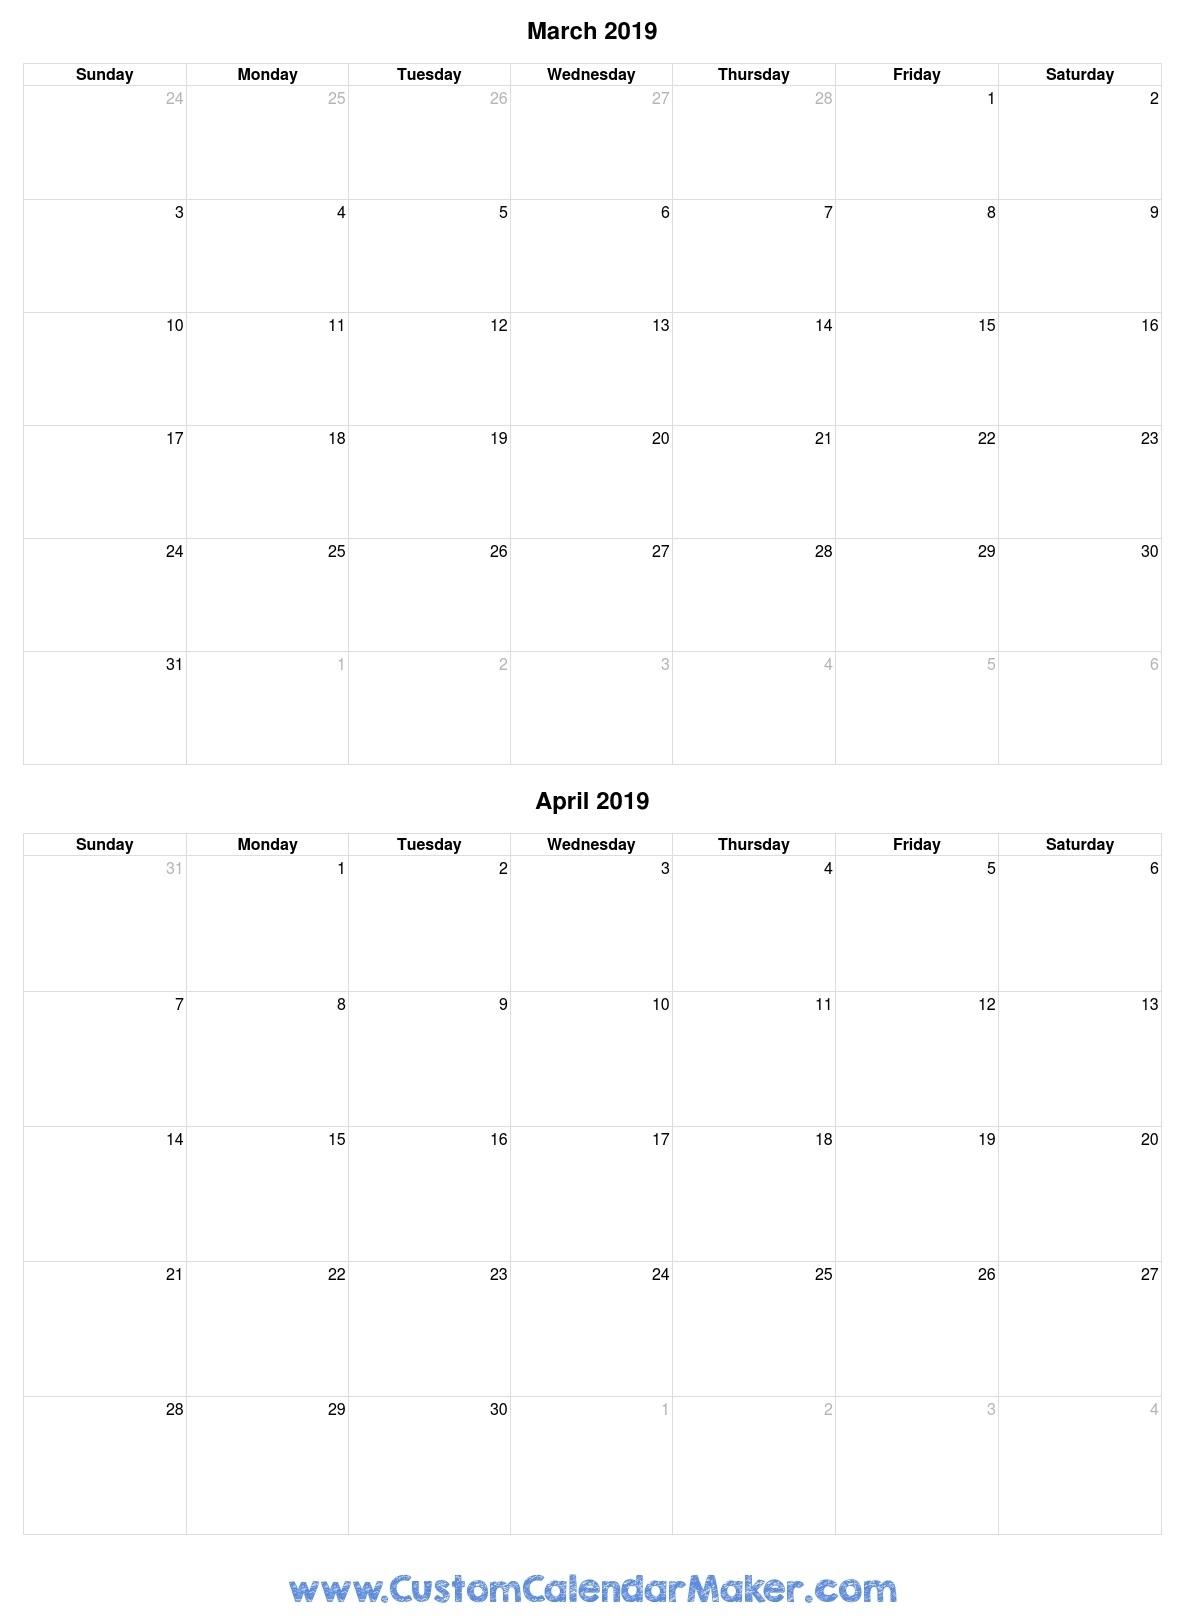 Get Calendar April To March